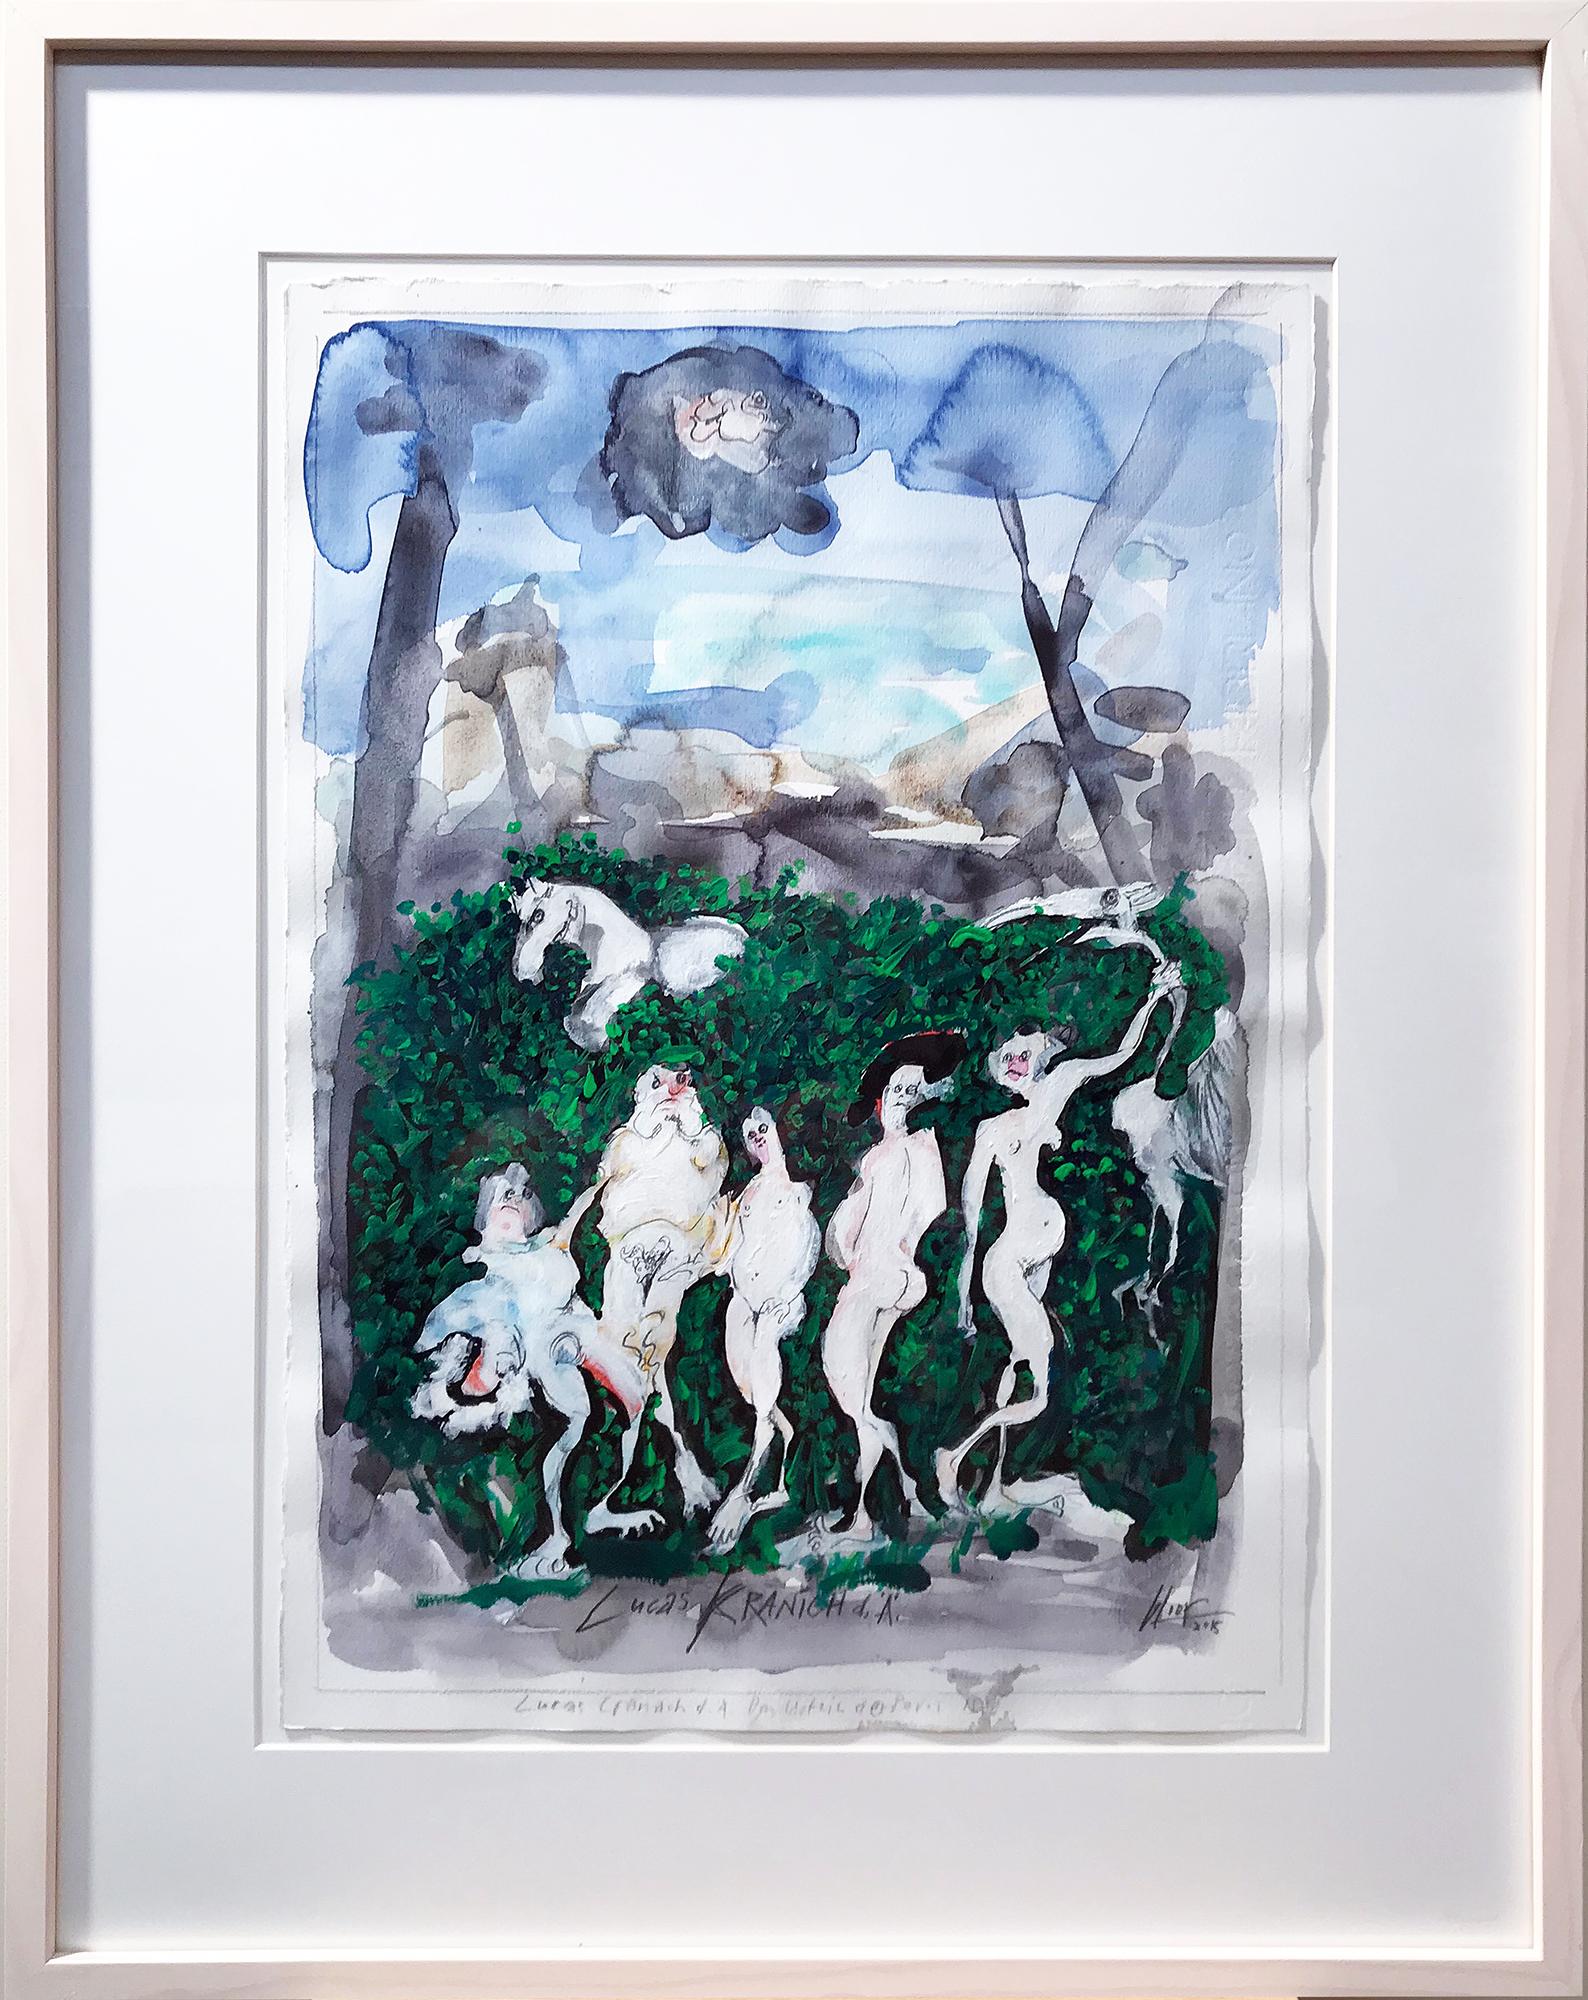 Lukas Kranach d.Ä., 2015, Mischtechnik auf Büttenpapier, 35 x 48 cm, Holzrahmen, Rahmenmass 53 x 68 cm